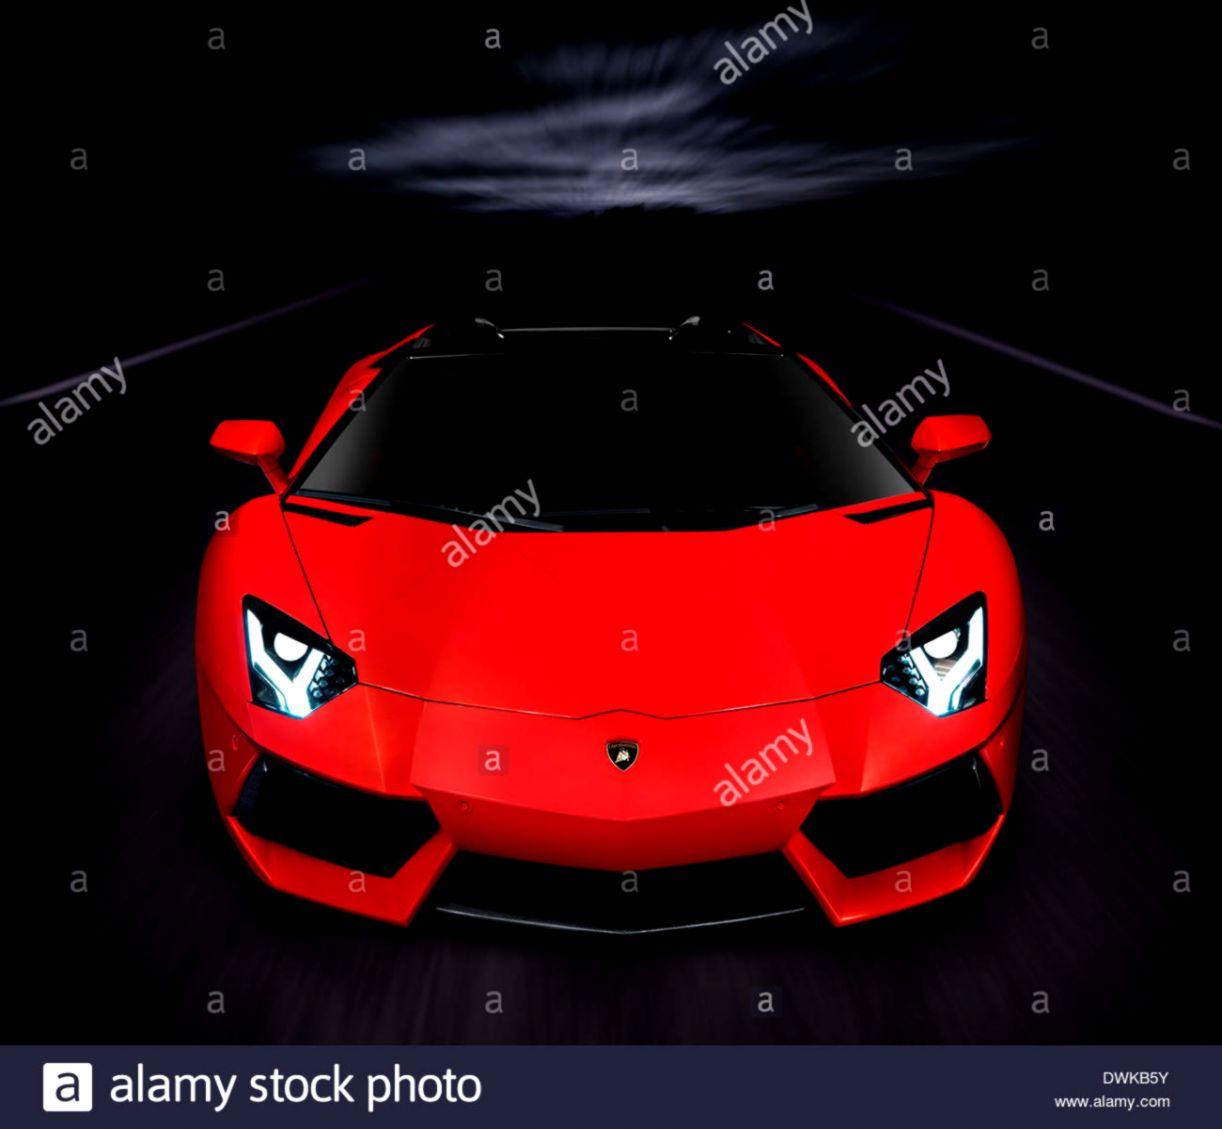 Lamborghini Aventador Lp 700 4 Supercar Night Hd Wallpaper